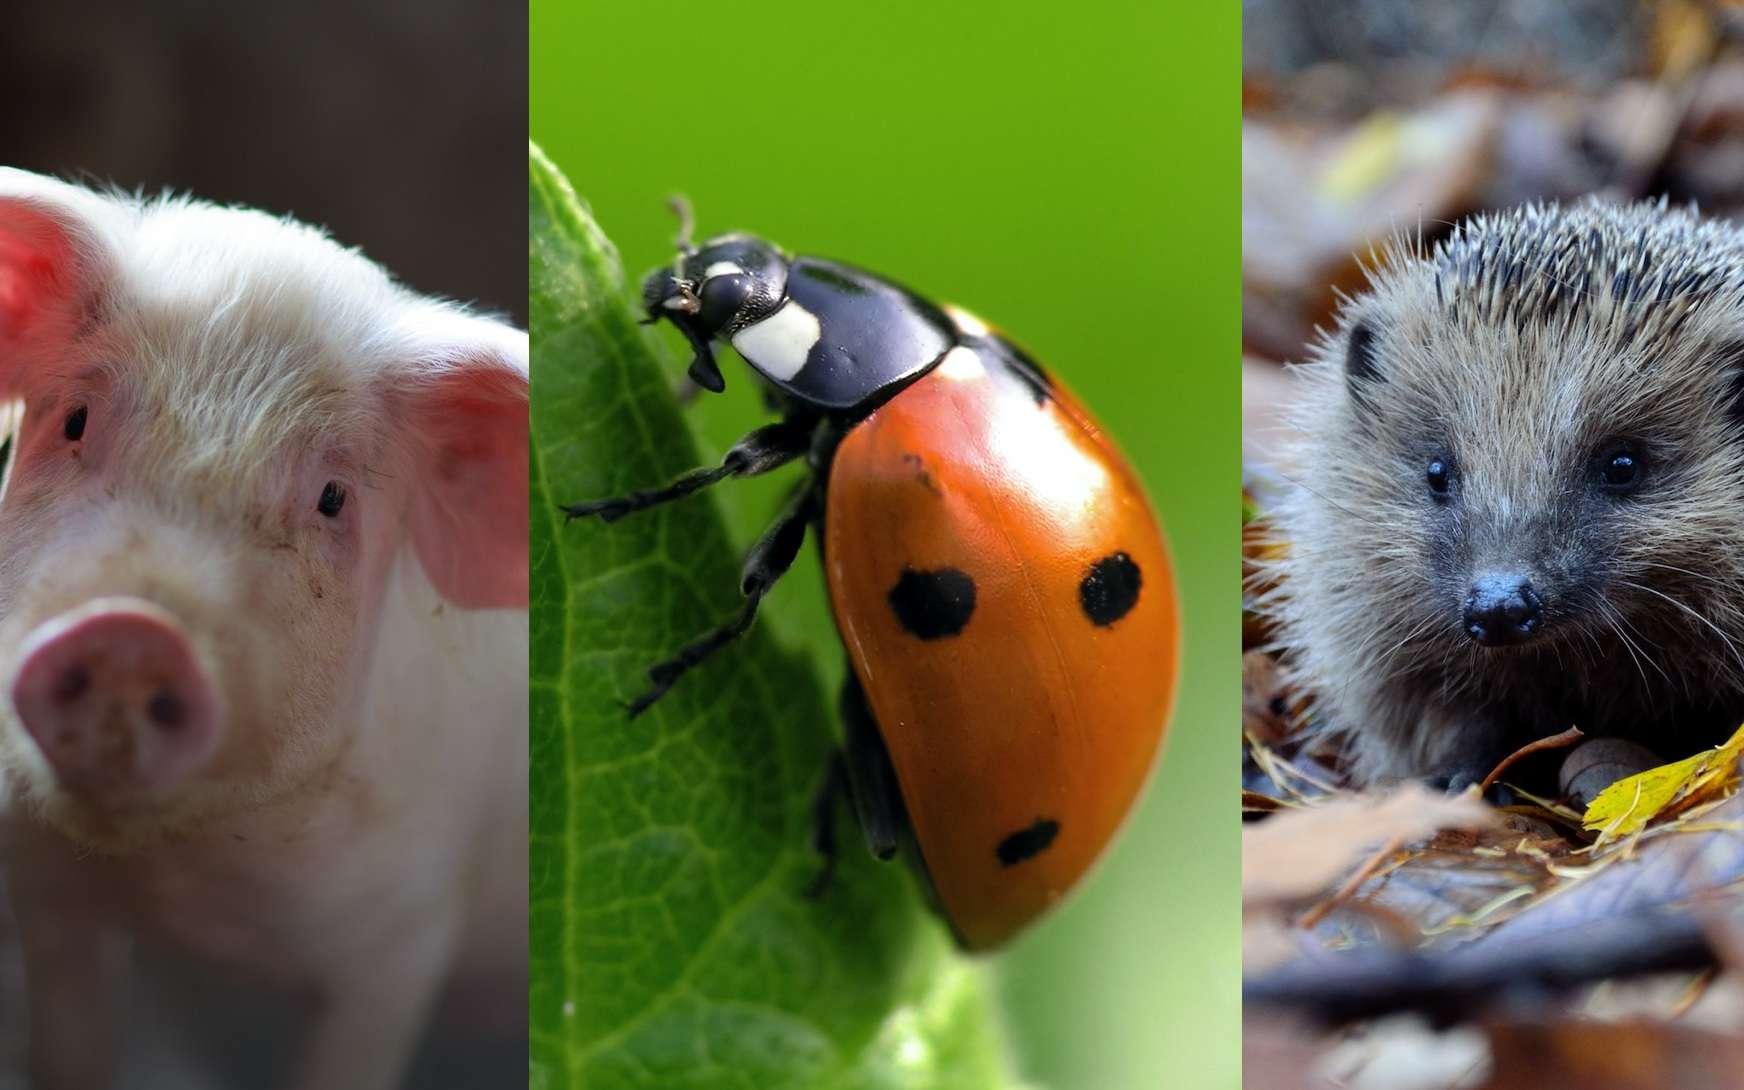 Le cannibalisme animal, un phénomène bien plus répandu qu'on ne pense. © Julian Dutton, Unsplash, Marek Kosmal, Adobe Stock, Piotr Łaskawski, Unsplash